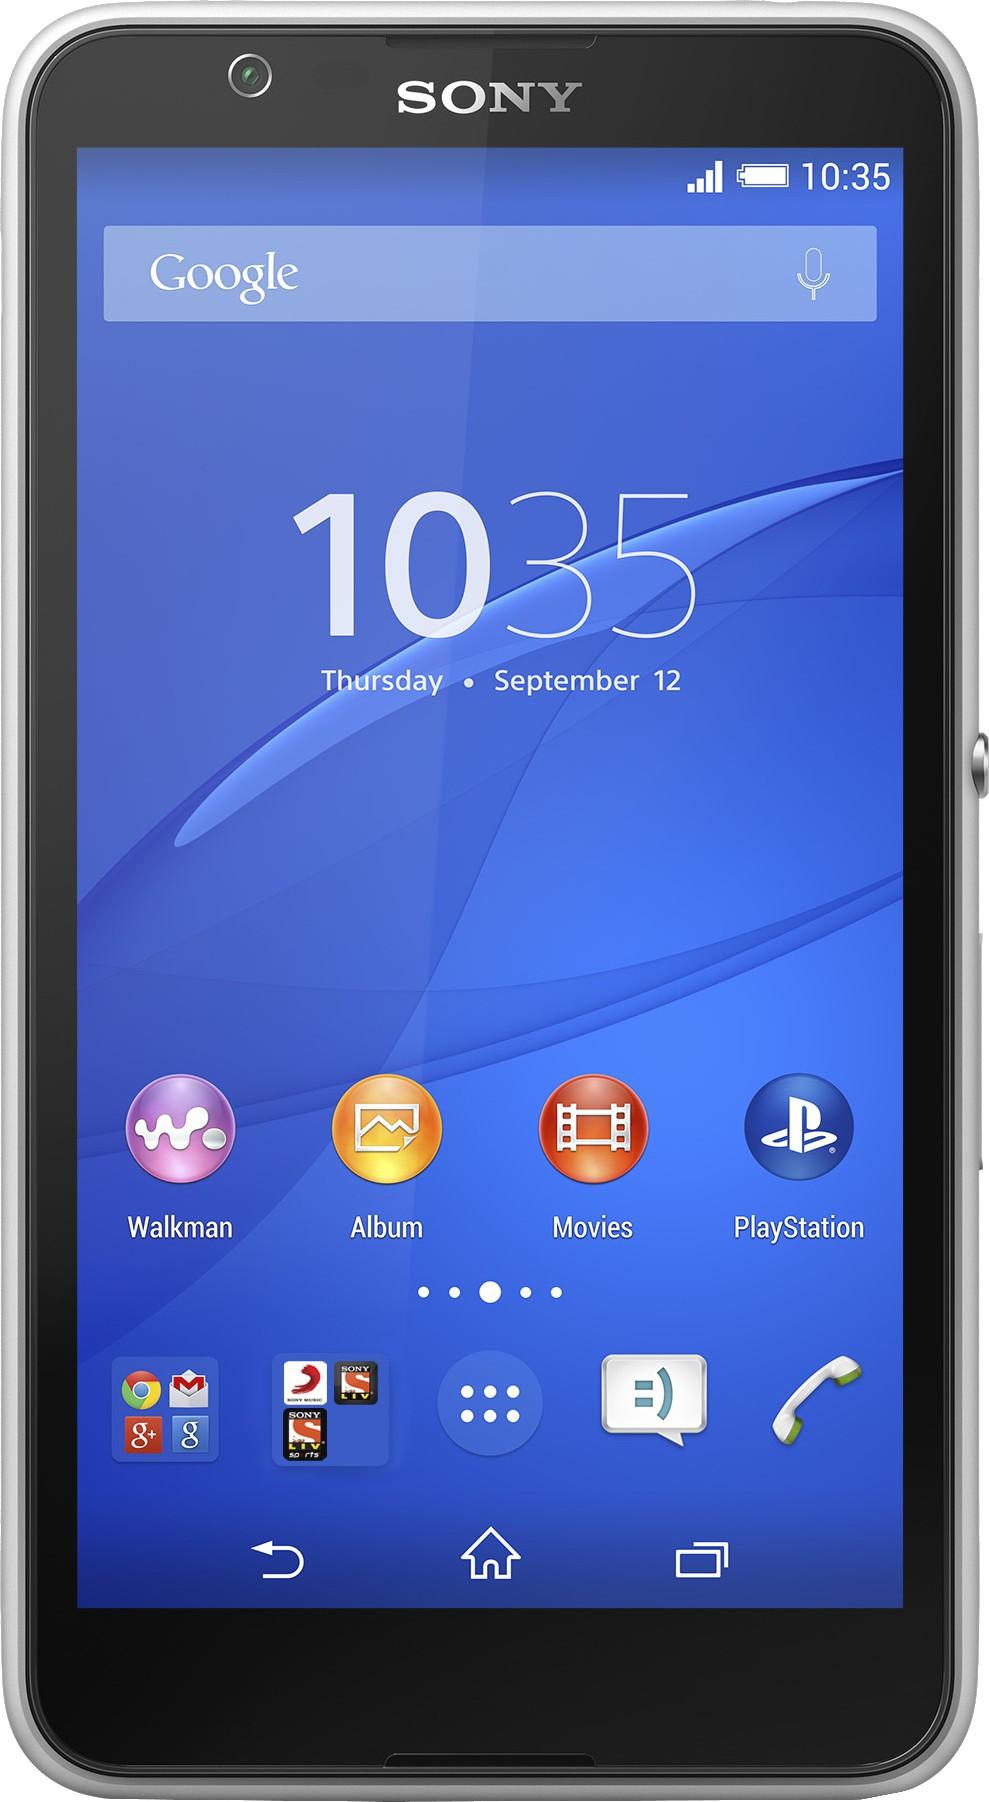 Sony Xperia E4 (1GB RAM, 8GB)